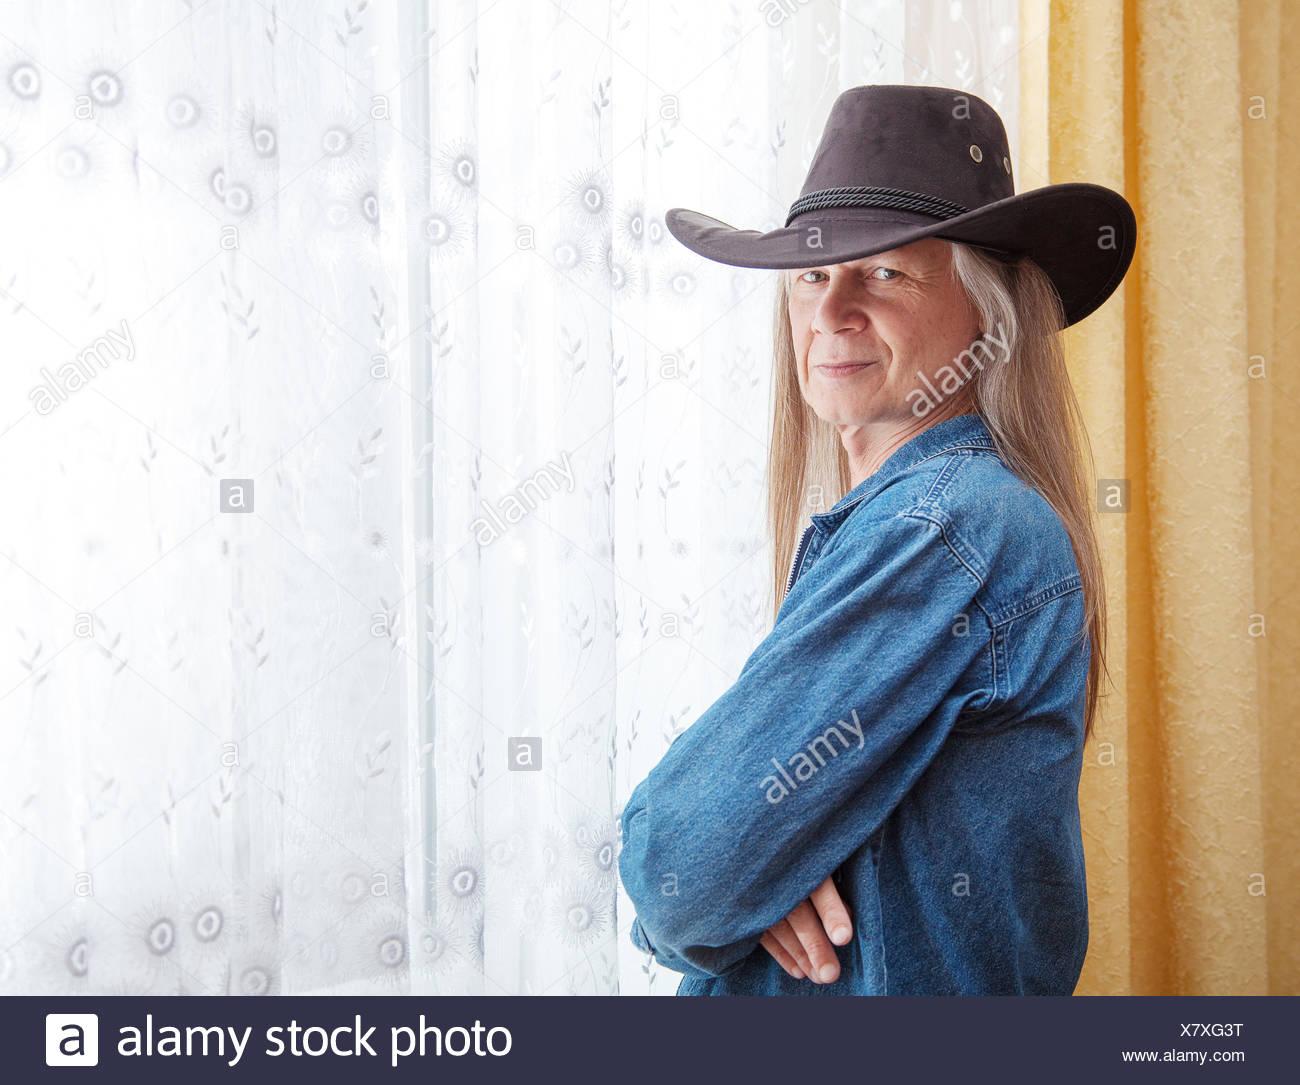 Cowboy Hat Imágenes De Stock   Cowboy Hat Fotos De Stock - Alamy 2dee2f63280